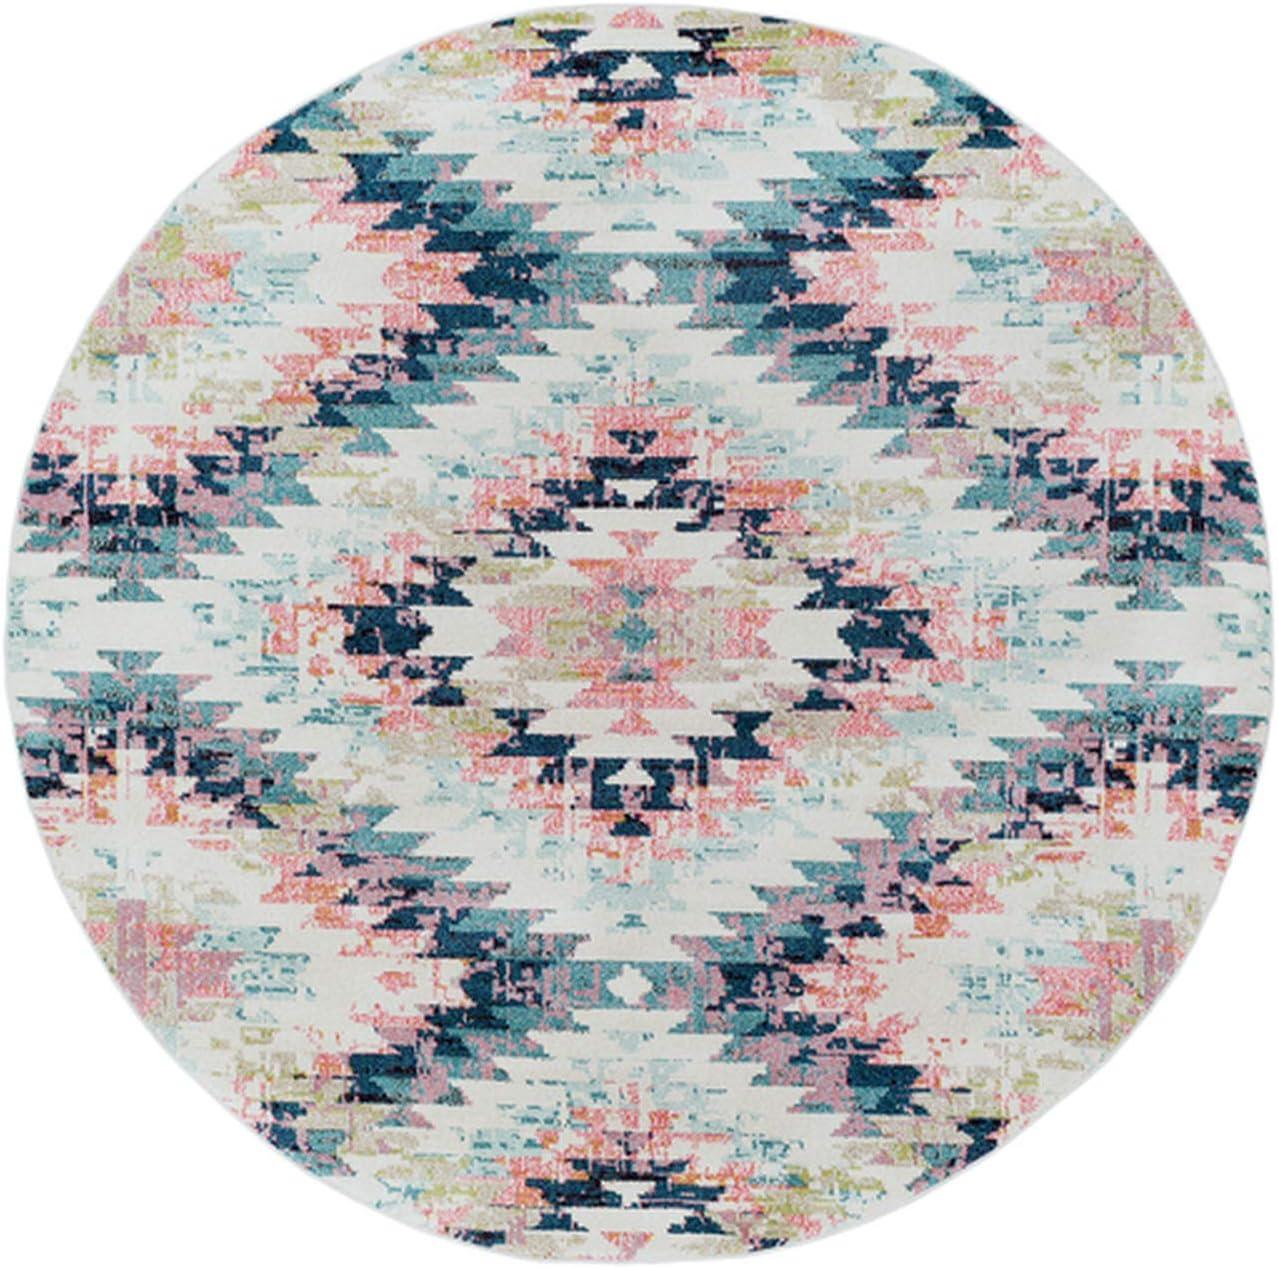 Lewisberry 7 10 Southwestern Area Rug – Round Native American Rug – Polypropylene – White, Beige, Camel, Aqua, Teal, Dark Blue, Bright Pink, Lime, Black, Charcoal